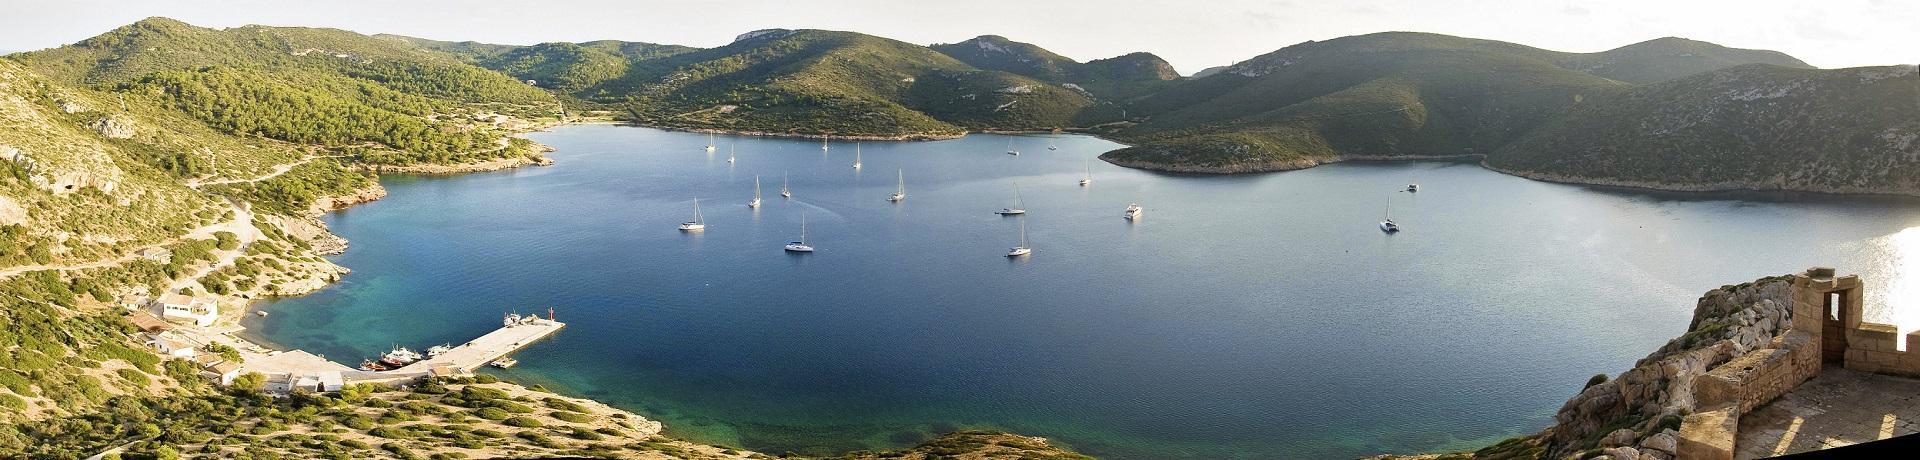 Spanien: Mallorca II - Emotion